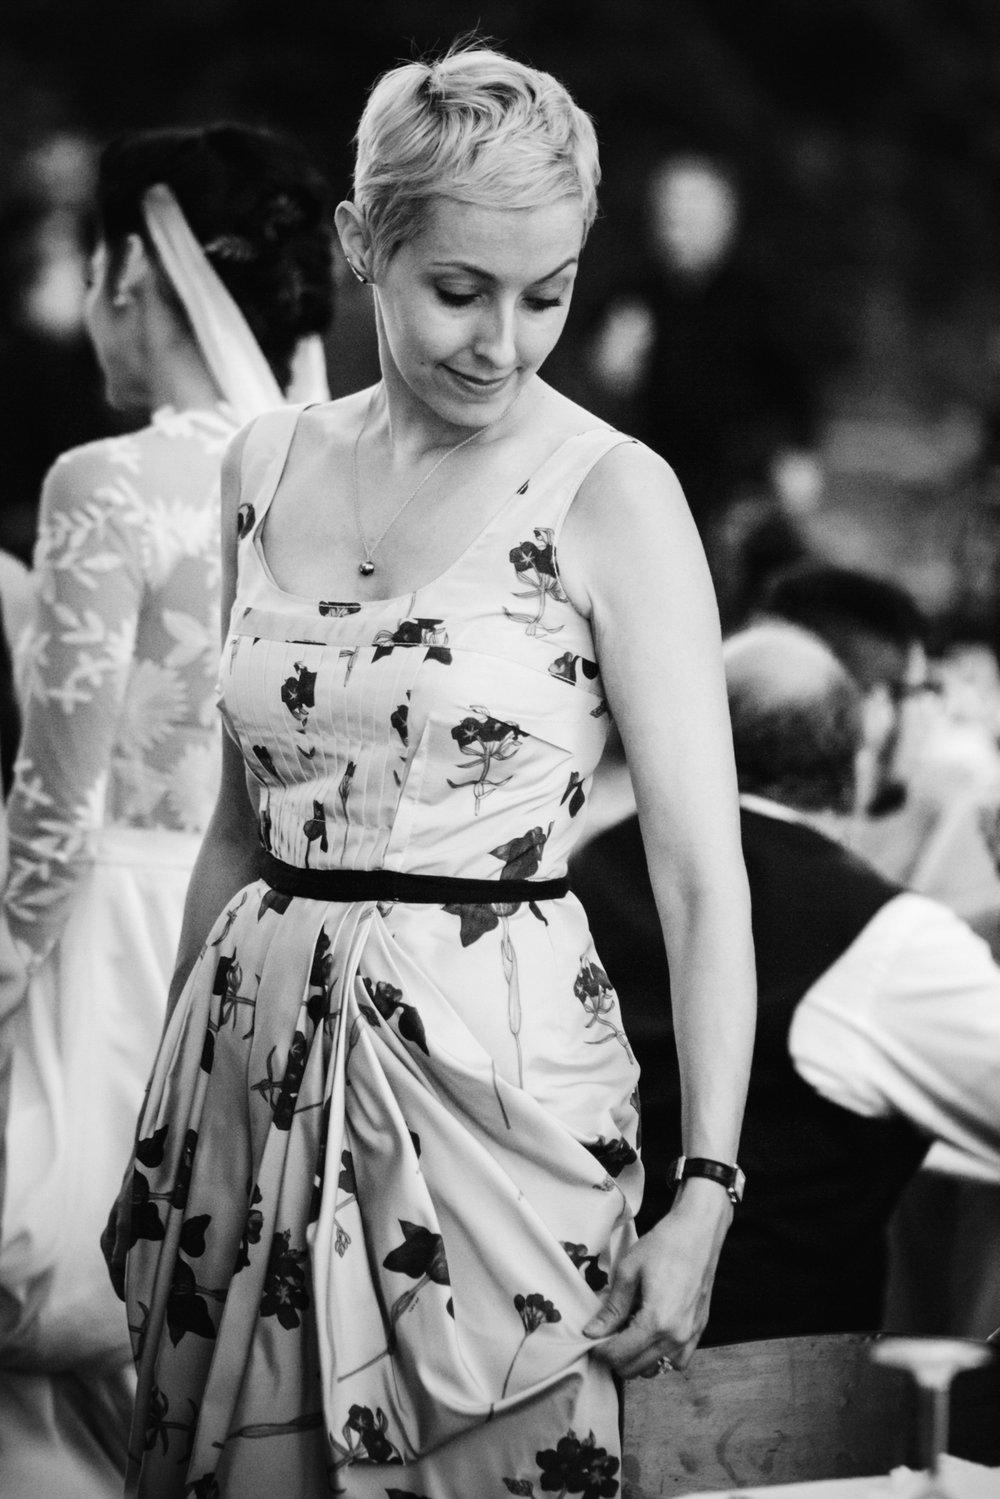 Kimberly-Coccagnia-Wedding-Photographer-251.JPG